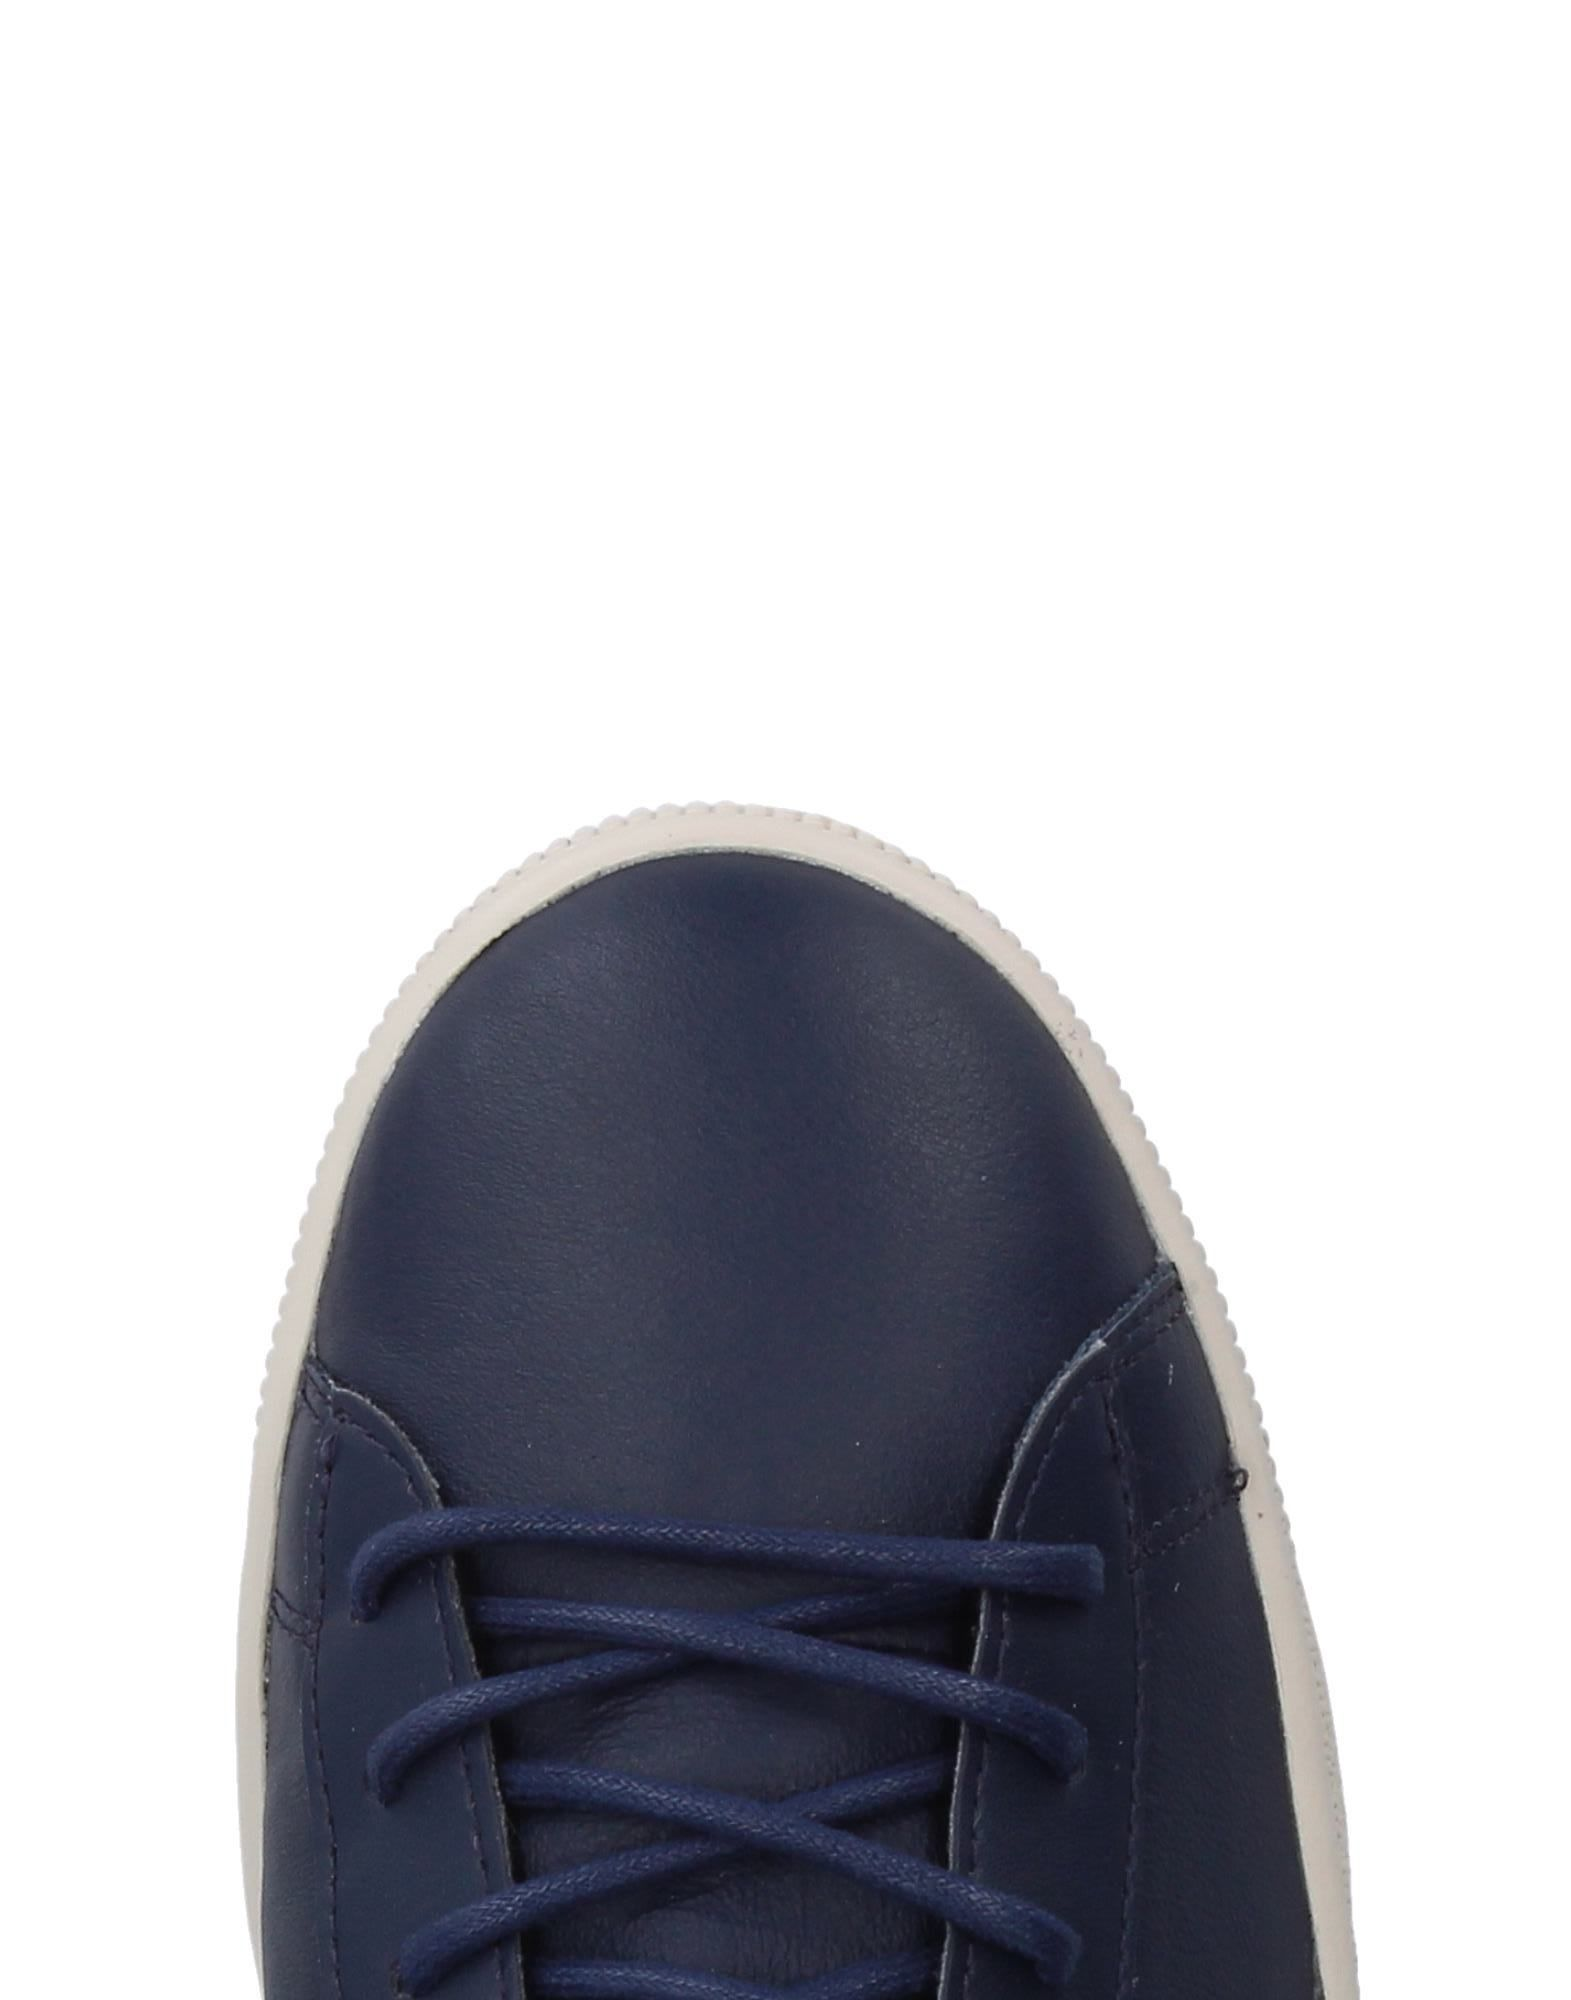 Puma Sneakers Herren  11219416SA 11219416SA  274dd6